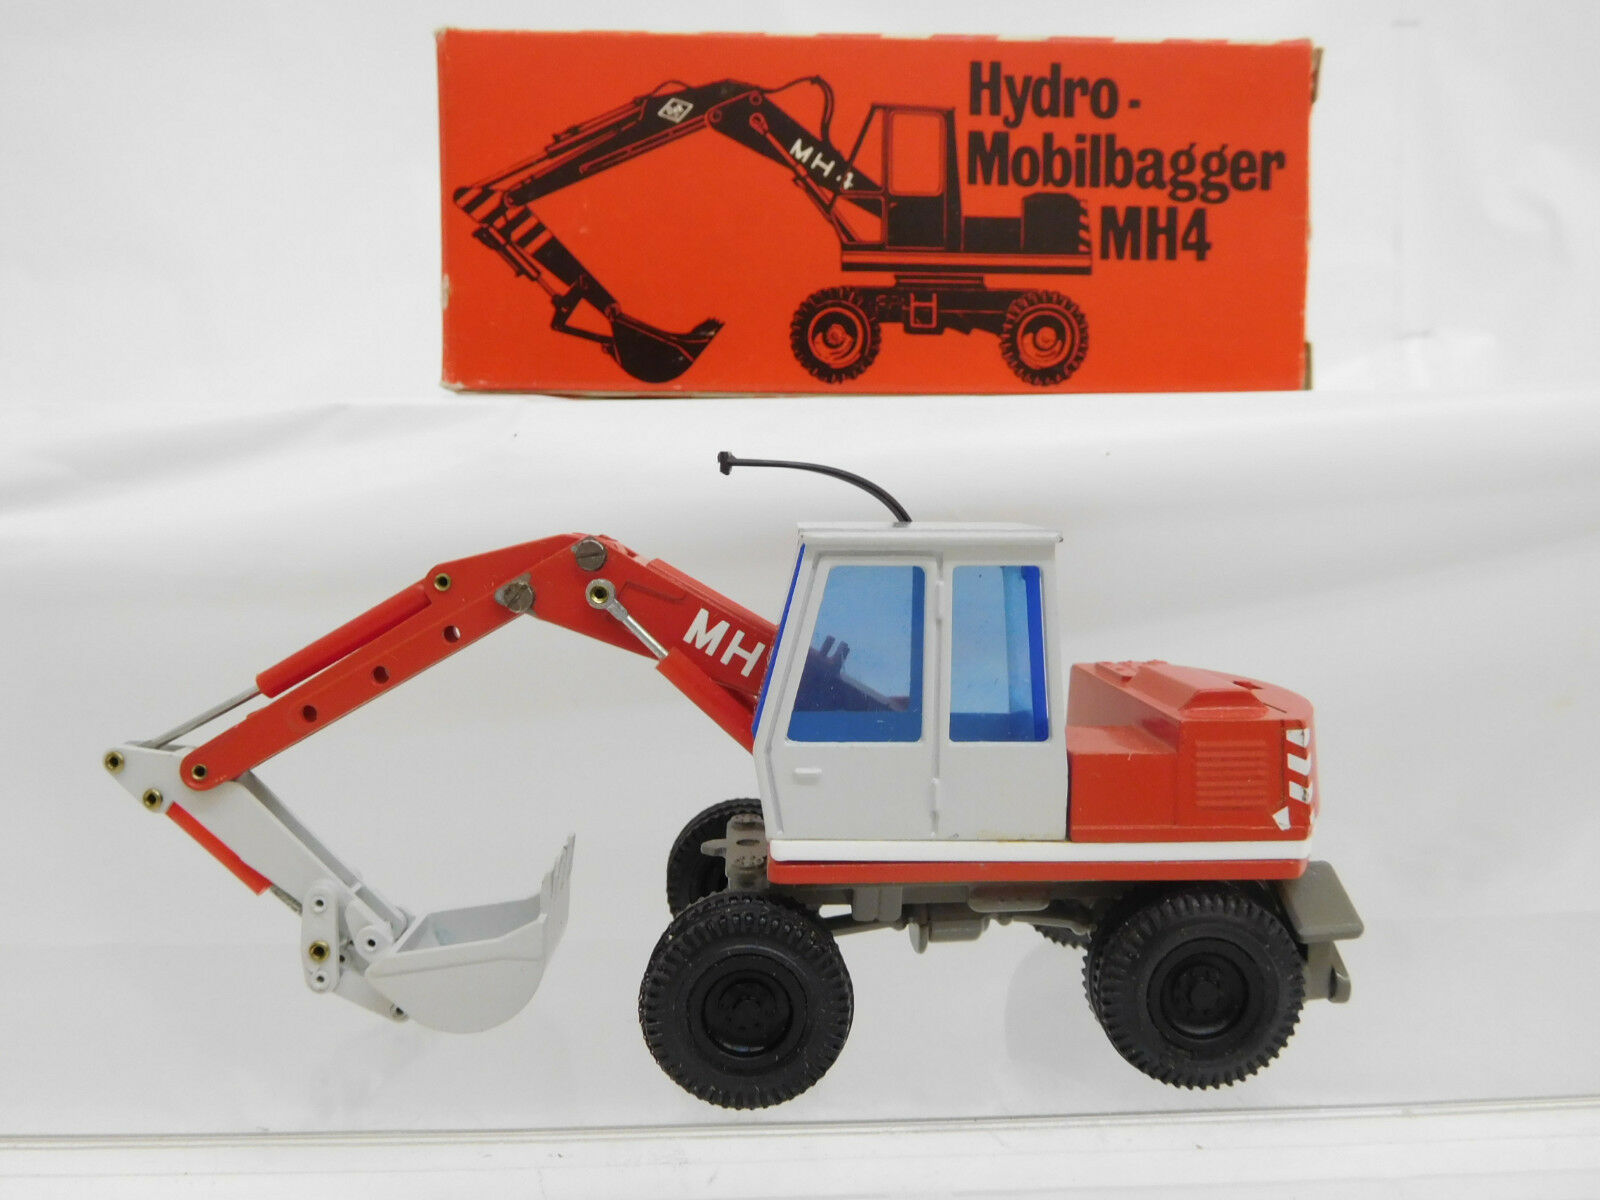 Mes-50921 NZG 162 1 50 o&k Hydro-Mobile Excavateurs mh4 très bon état